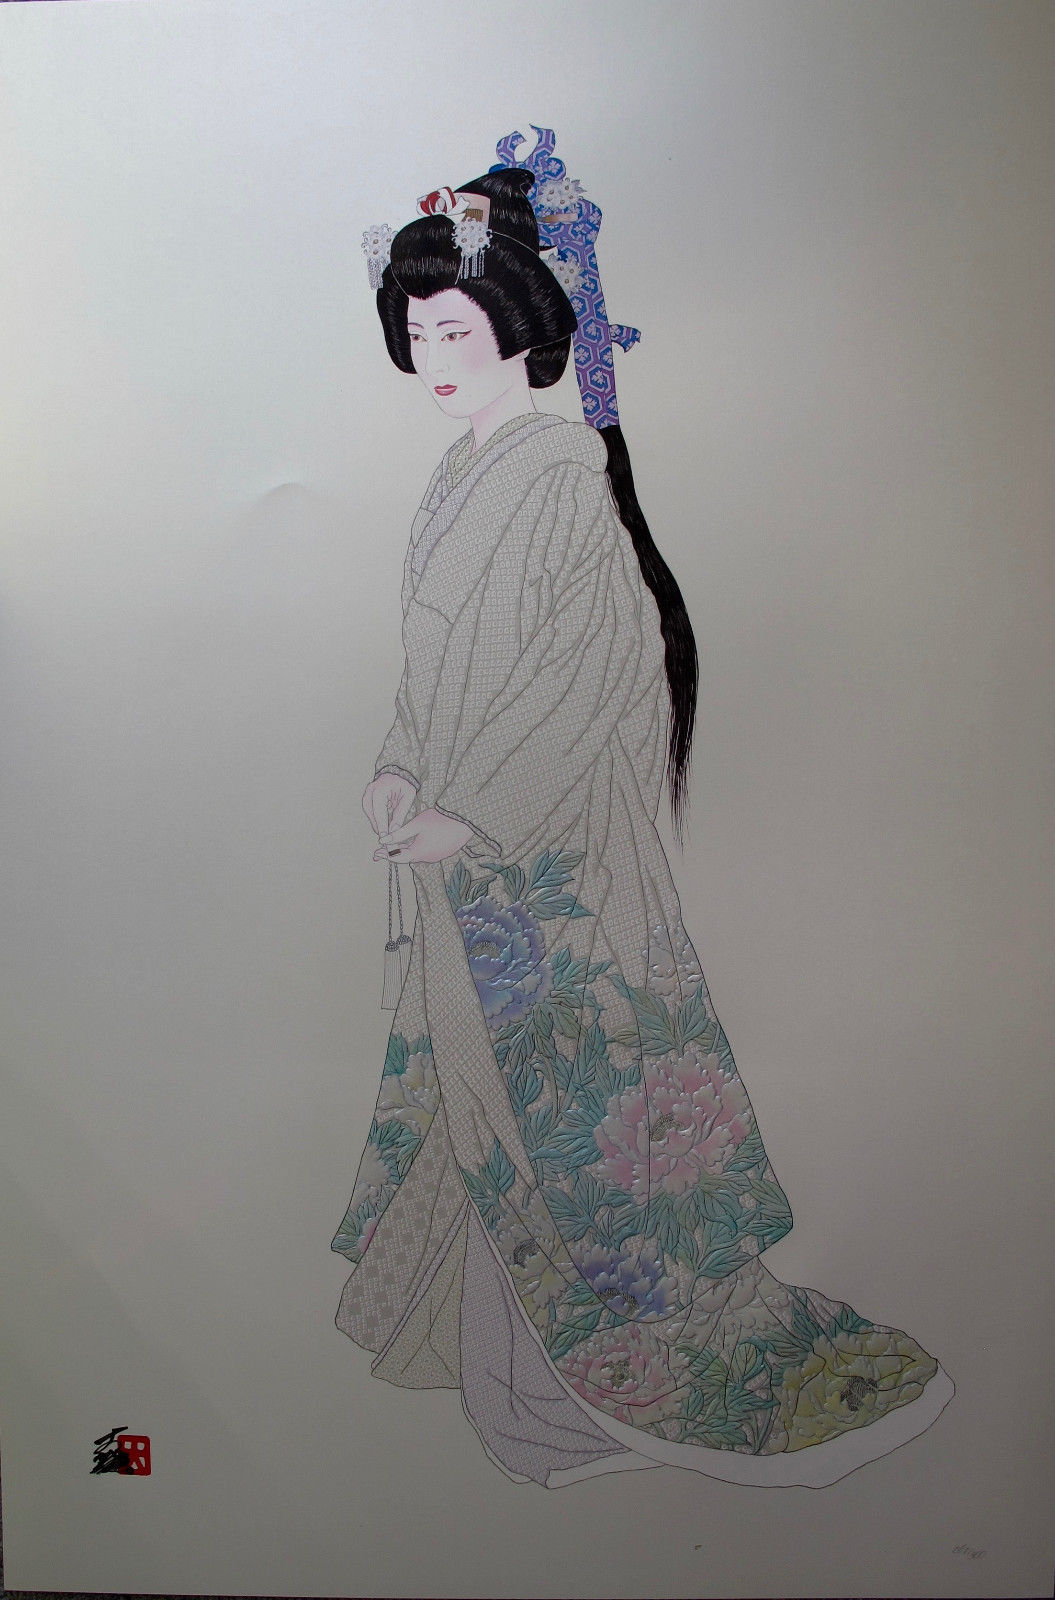 Hisashi Otsuka HANAYOME PURITY Hand Signed Limited Edition Art Pearl Gold & Leaf